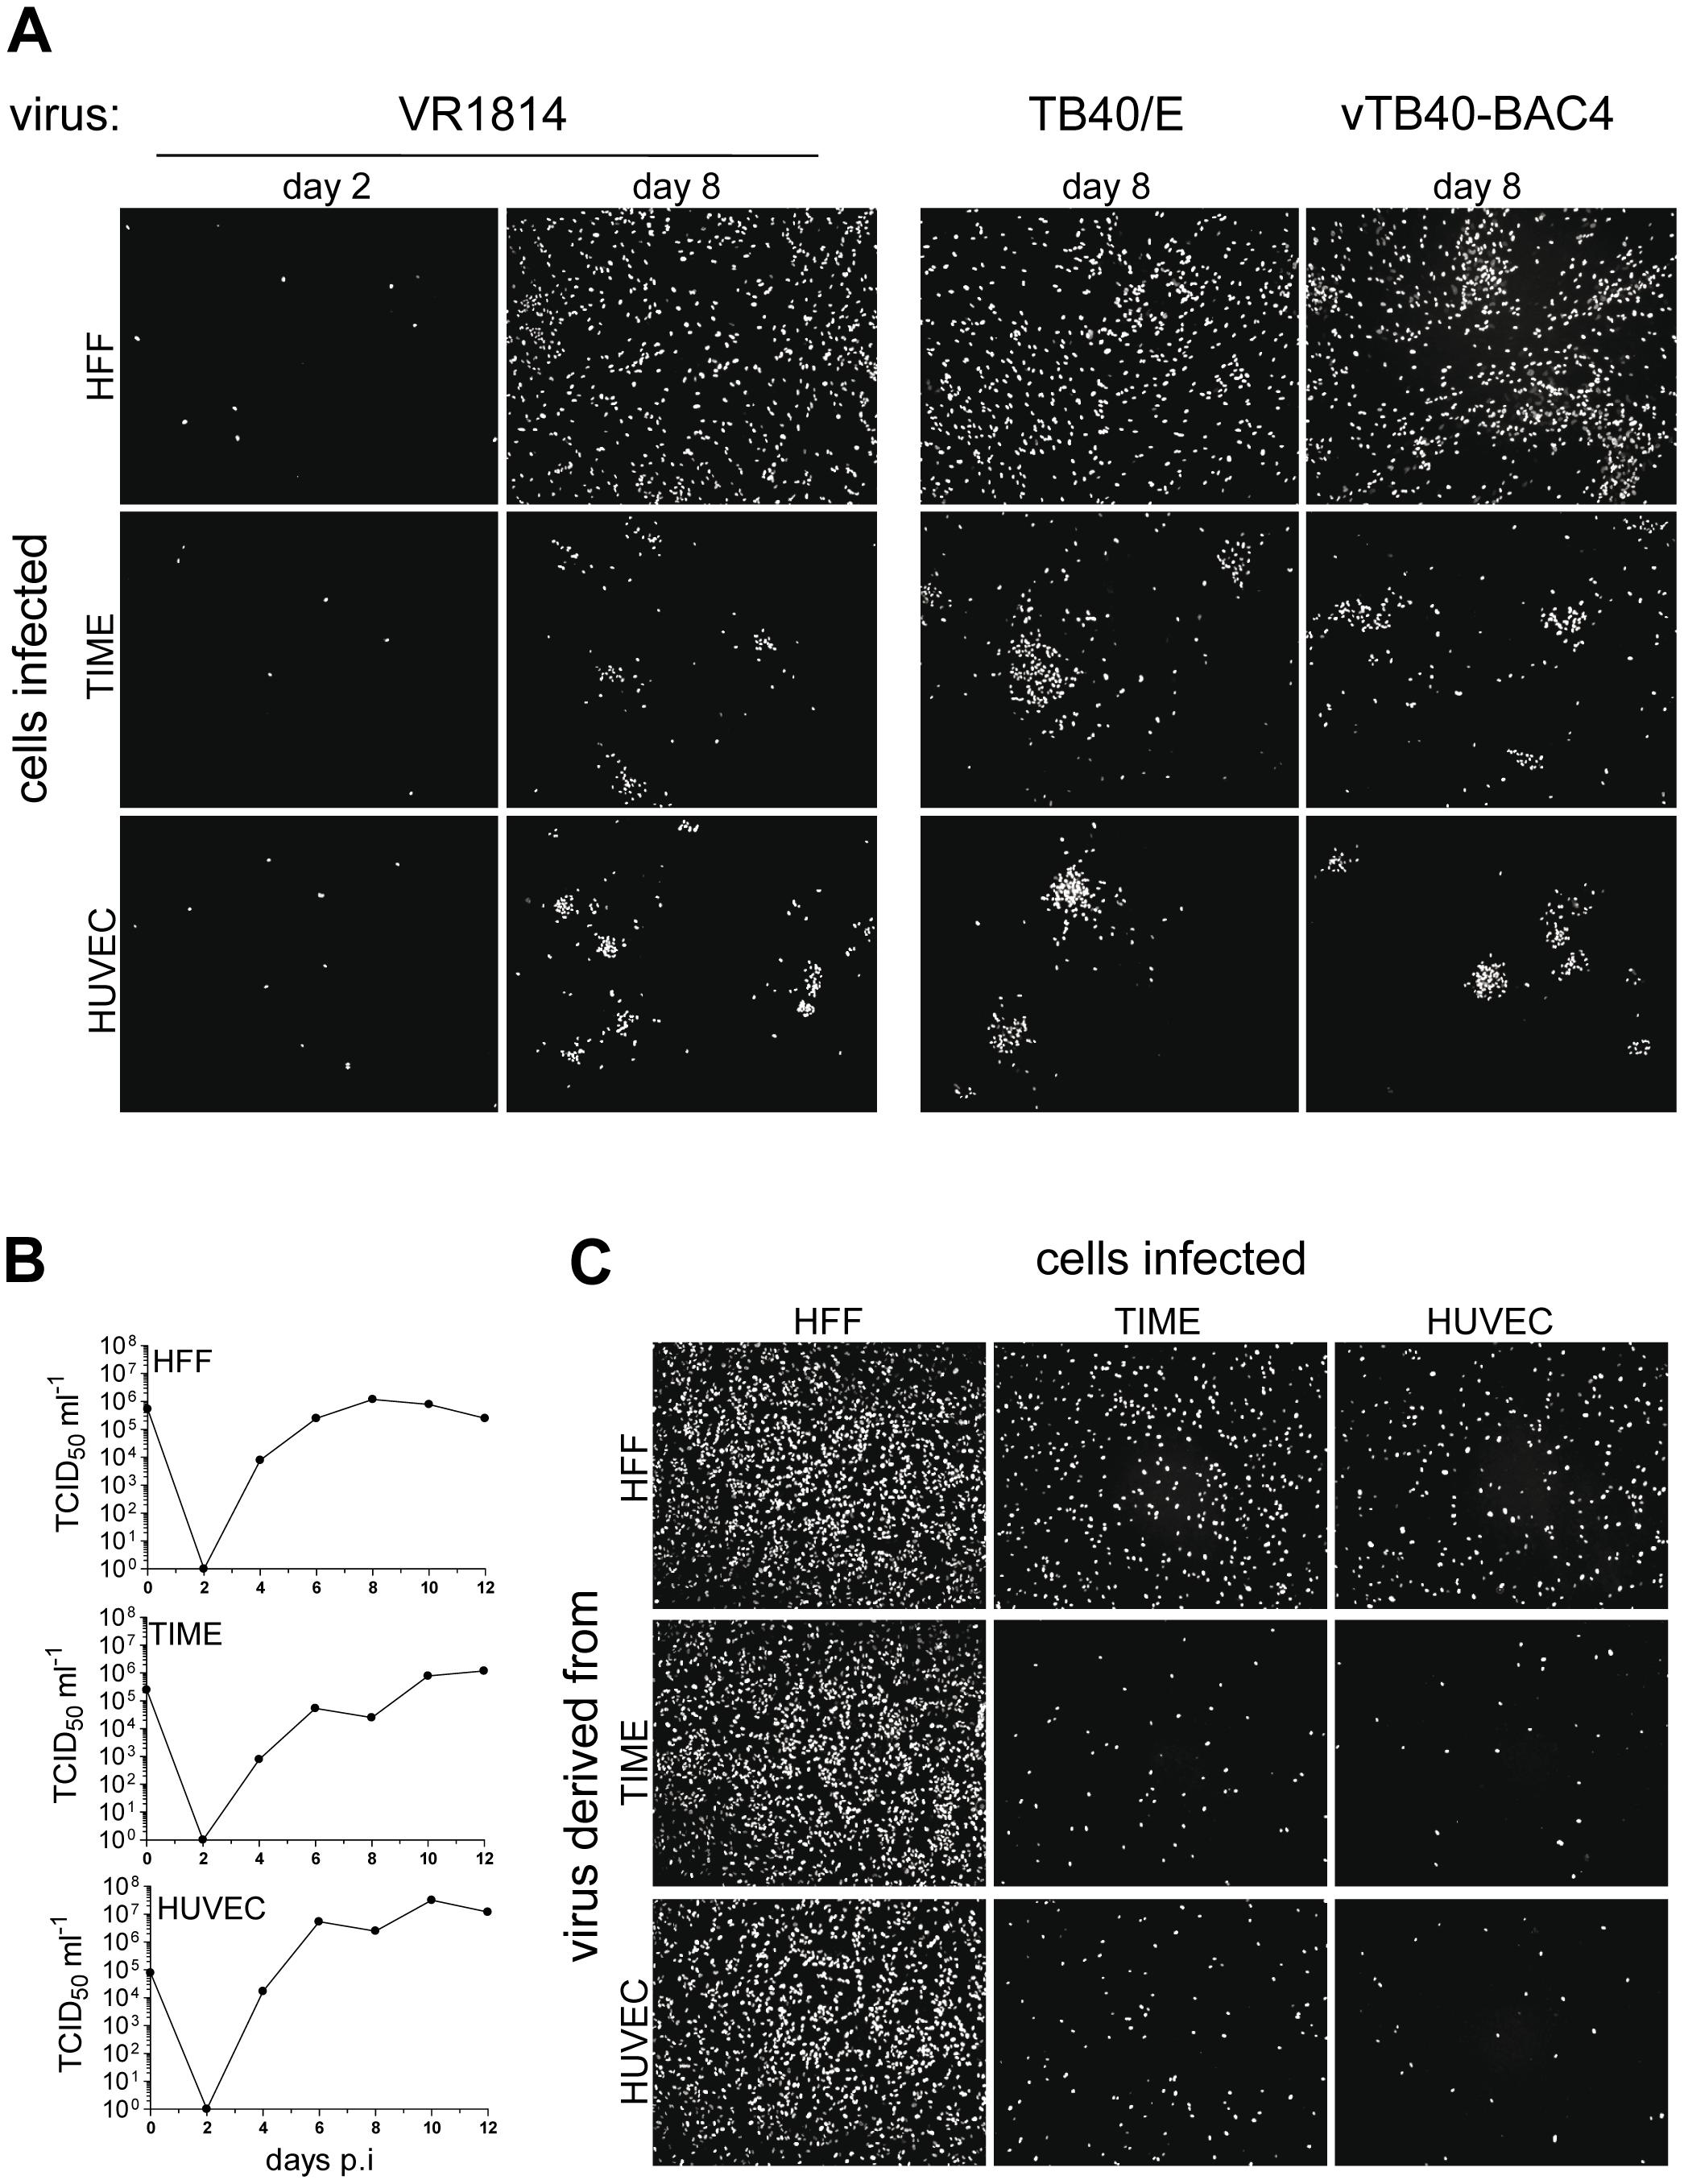 HCMV spread in fibroblast and EC cultures.